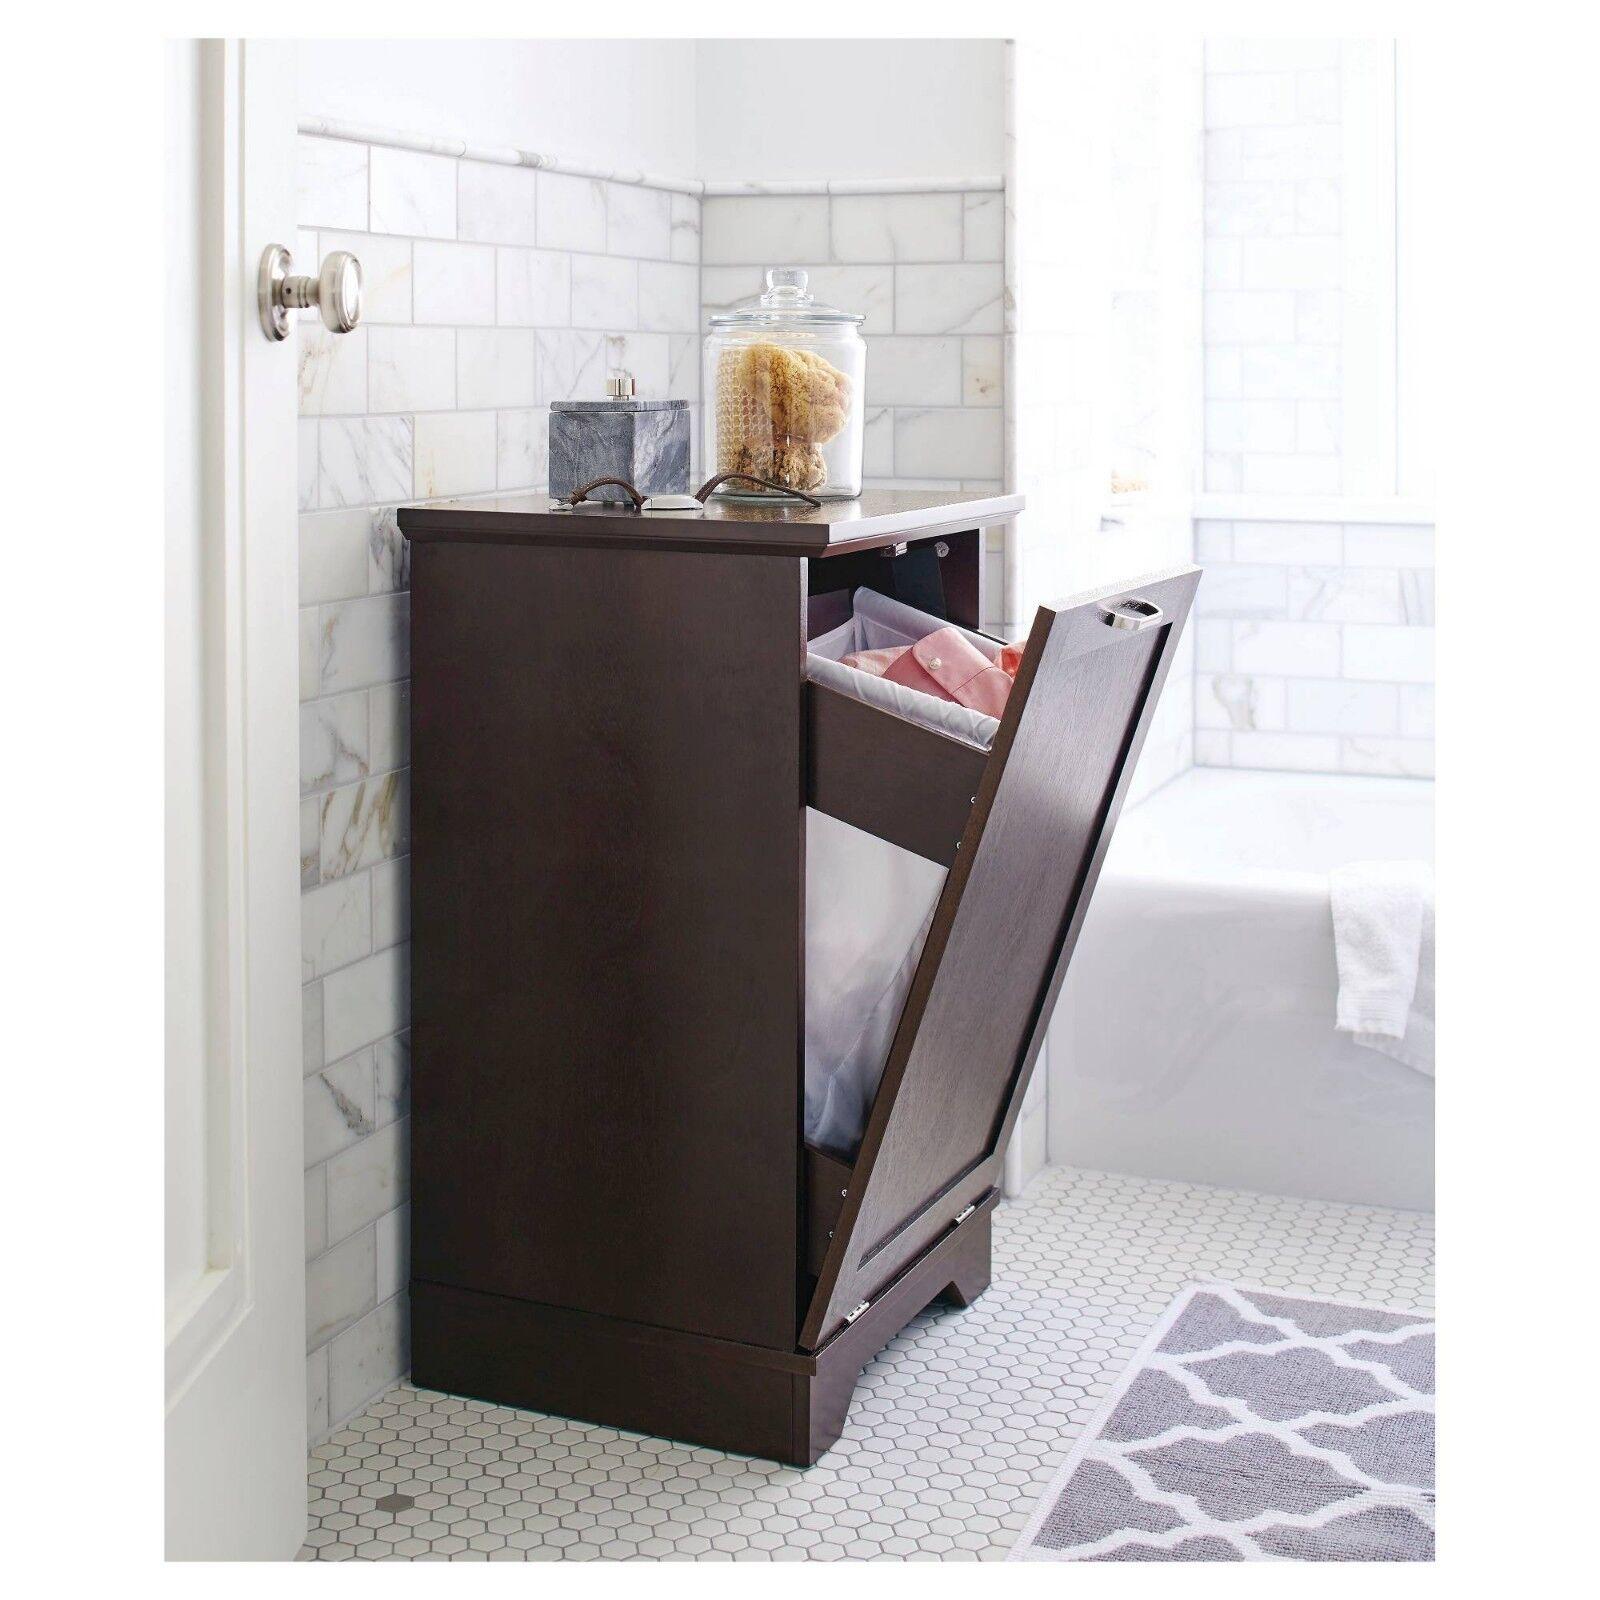 $143.34 - Threshold Home Furnishings Laundry Tilt Out Wood Hamper - Brown (NIB)